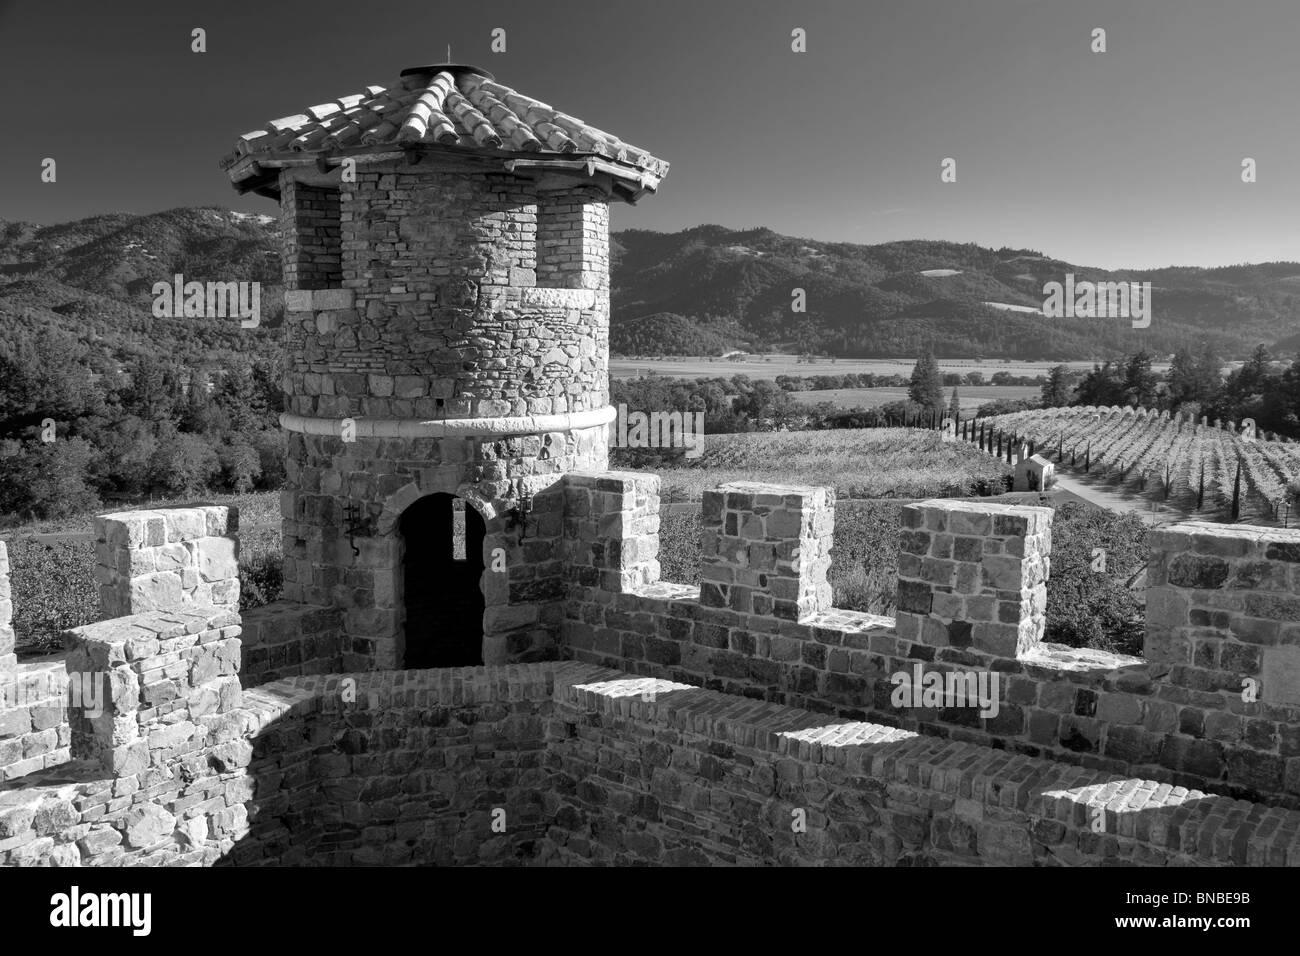 Schloss-Turm im Castello di Amorosa. Napa Valley, Kalifornien. Eigenschaft relased Stockbild